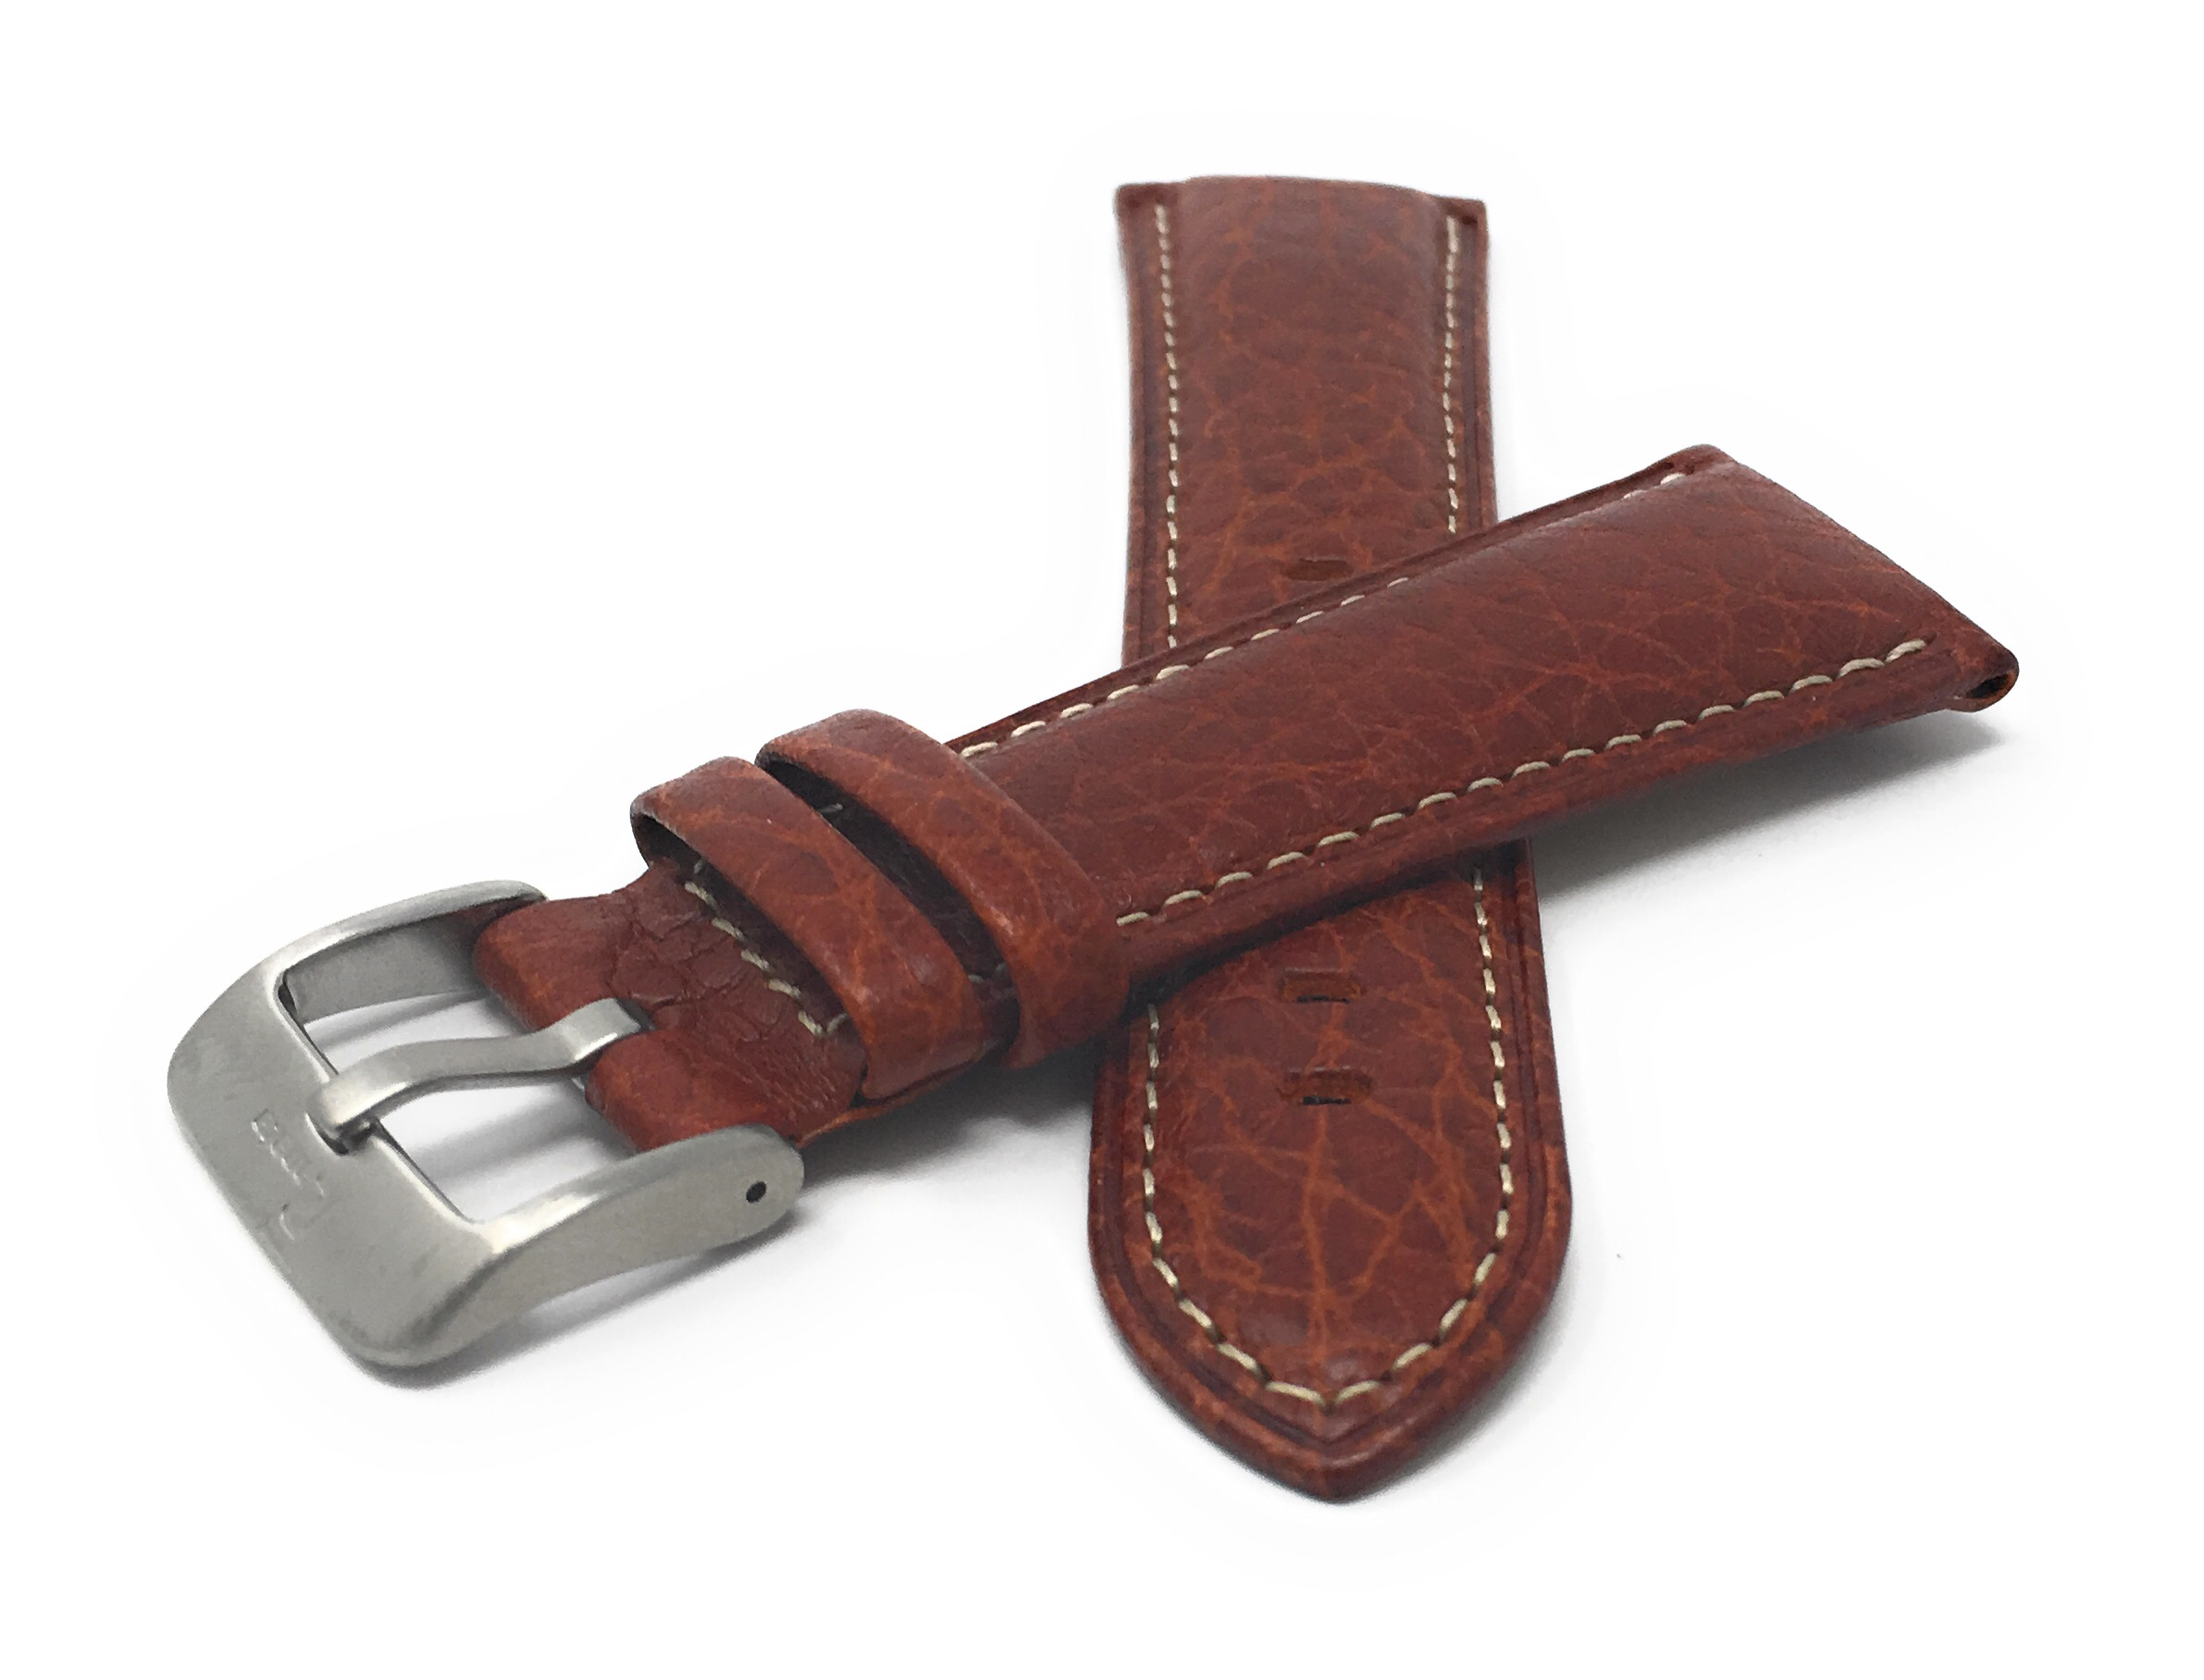 Bandini-Mens-Italian-Leather-Watch-Band-Strap-Padded-Stitch-18mm-19mm-20mm-24mm thumbnail 10